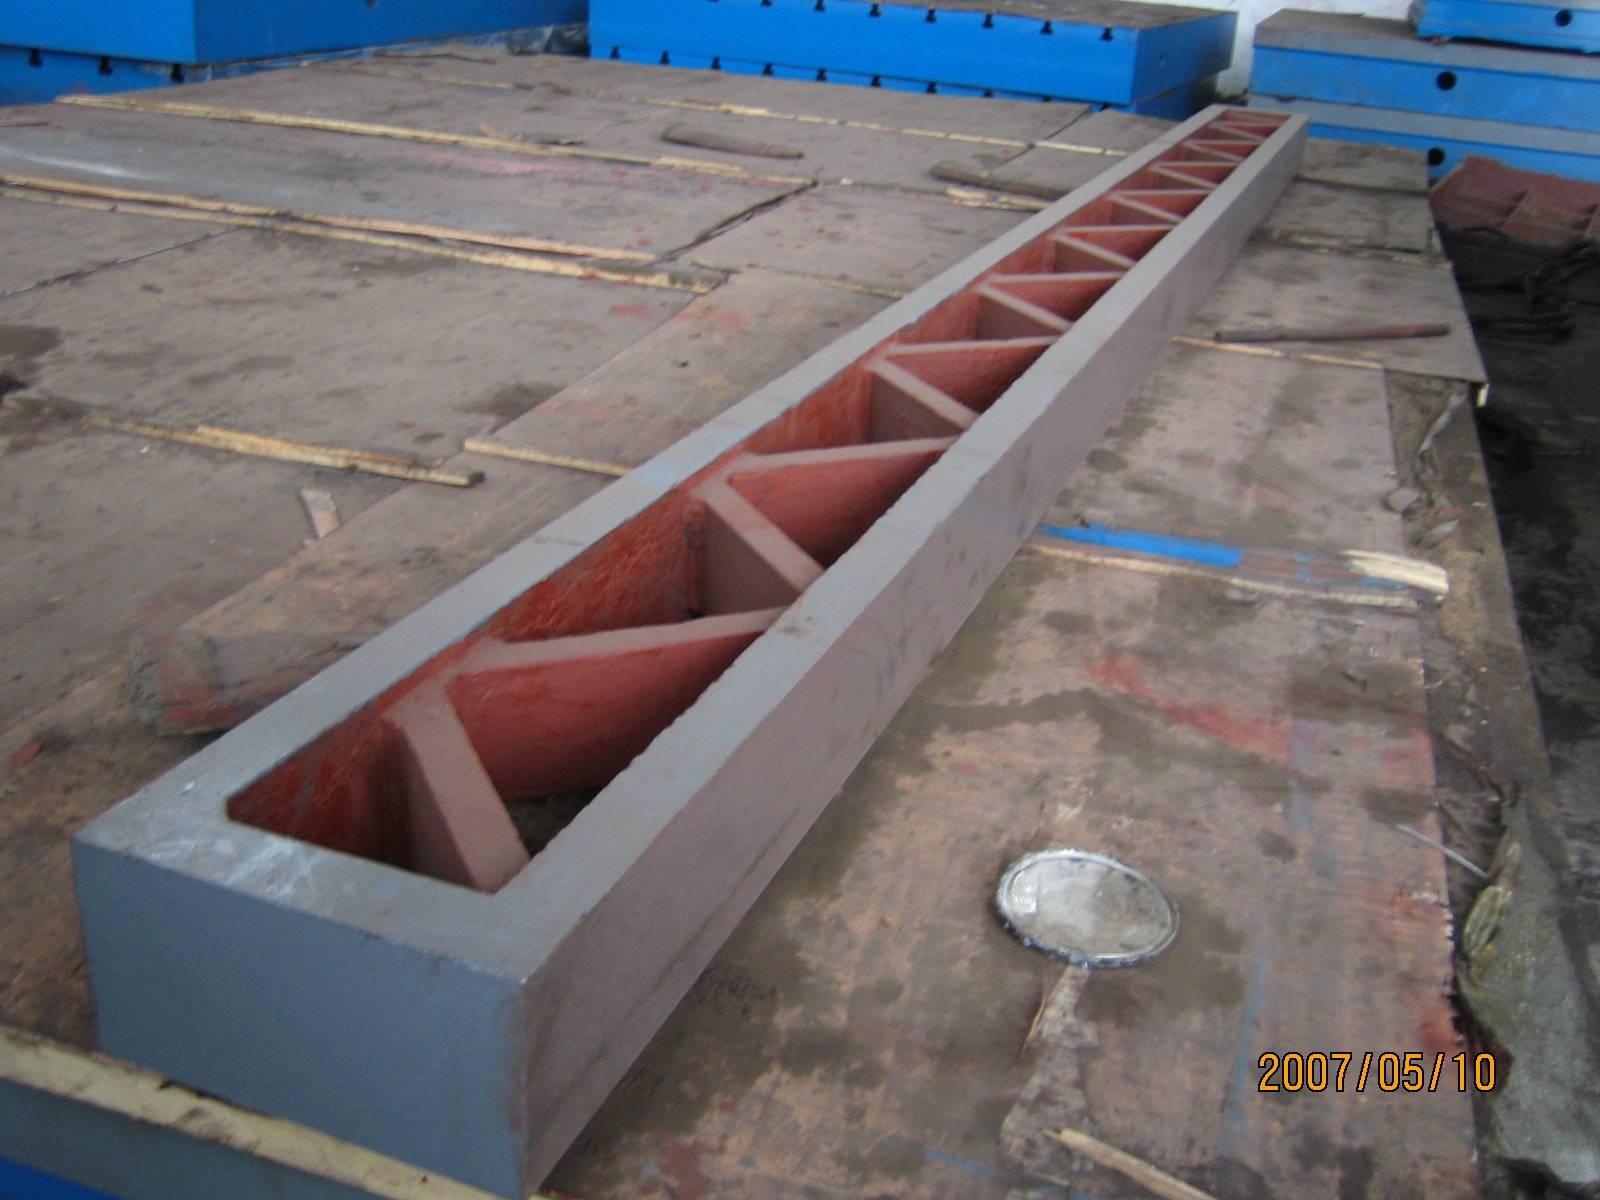 Measuring Level Ruler Equipment Installing Cast Iron straight edge instrument